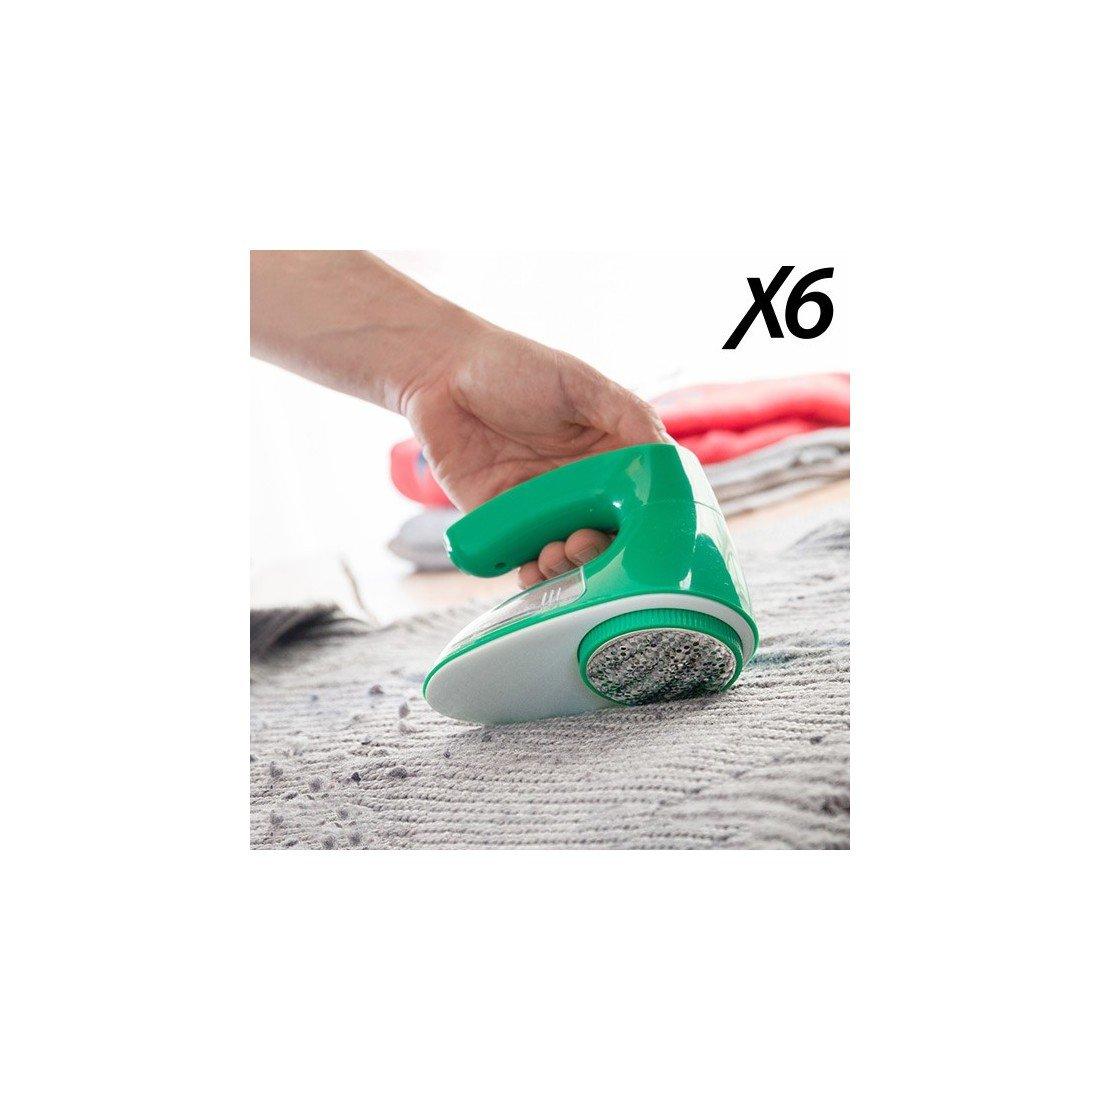 X6Bobble Remover–Spazzola Pelucchi, elettrico, 5V, colore: verde InnovaGoods IG113485